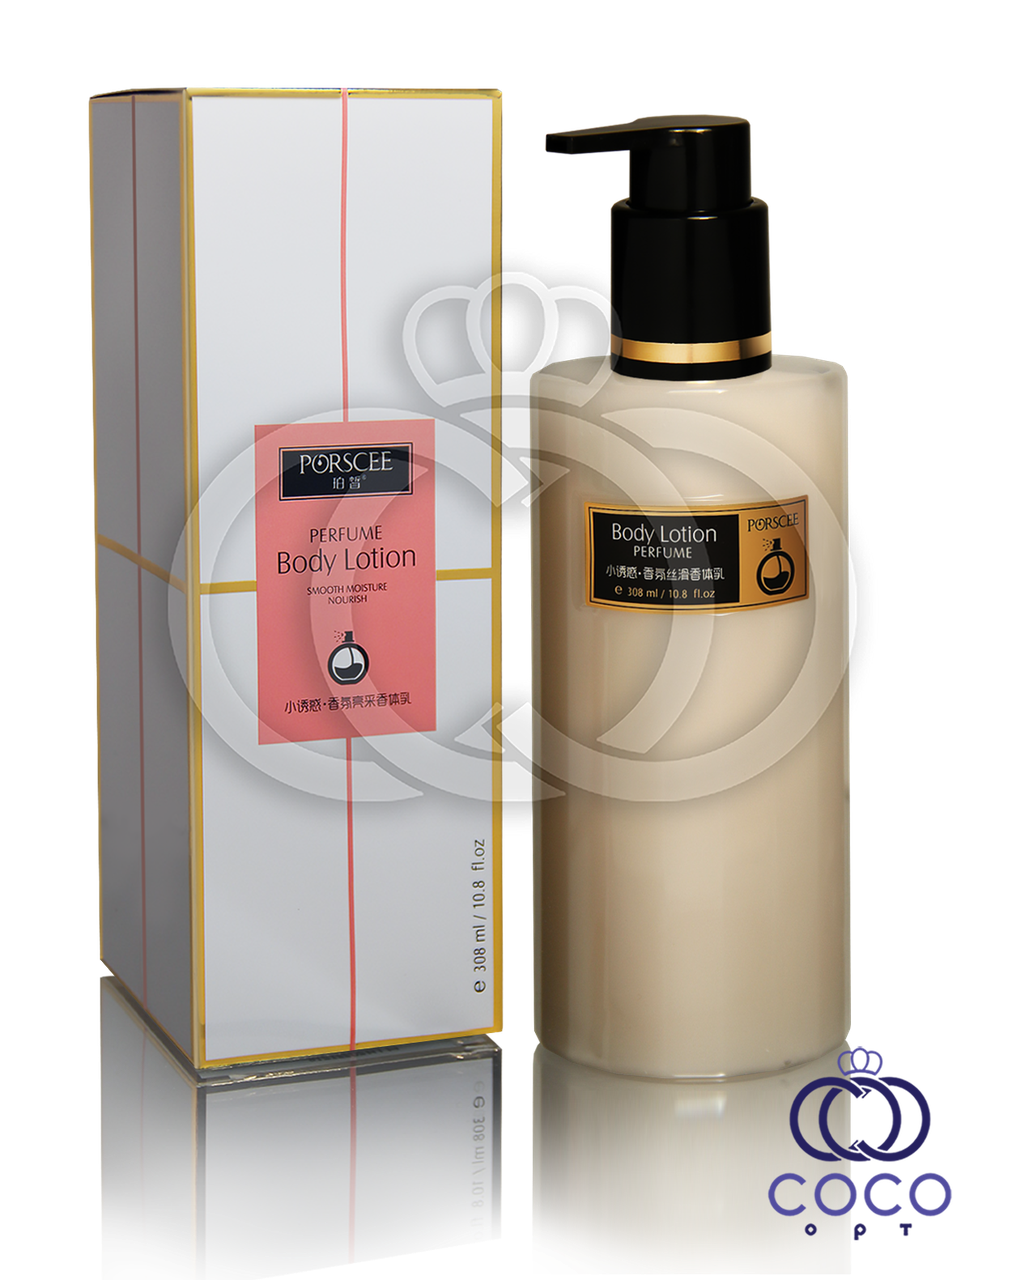 Парфюмированный лосьон для тела Perfume Body Lotion Peach